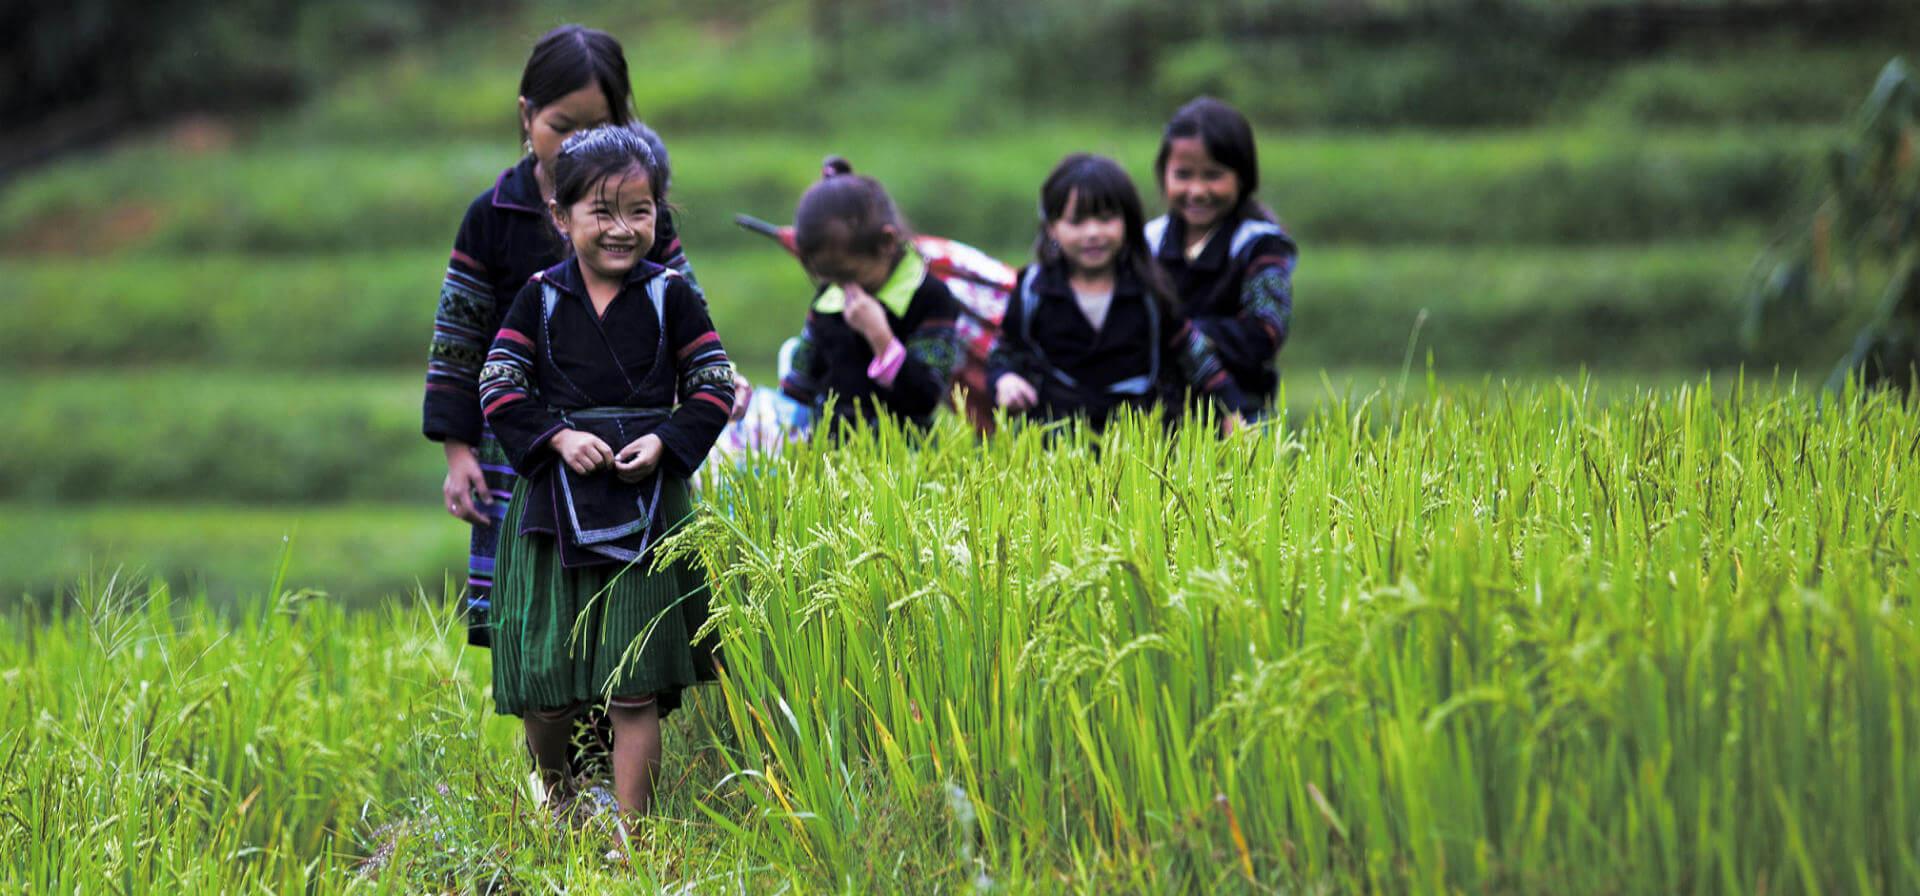 Family Fun in Vietnam